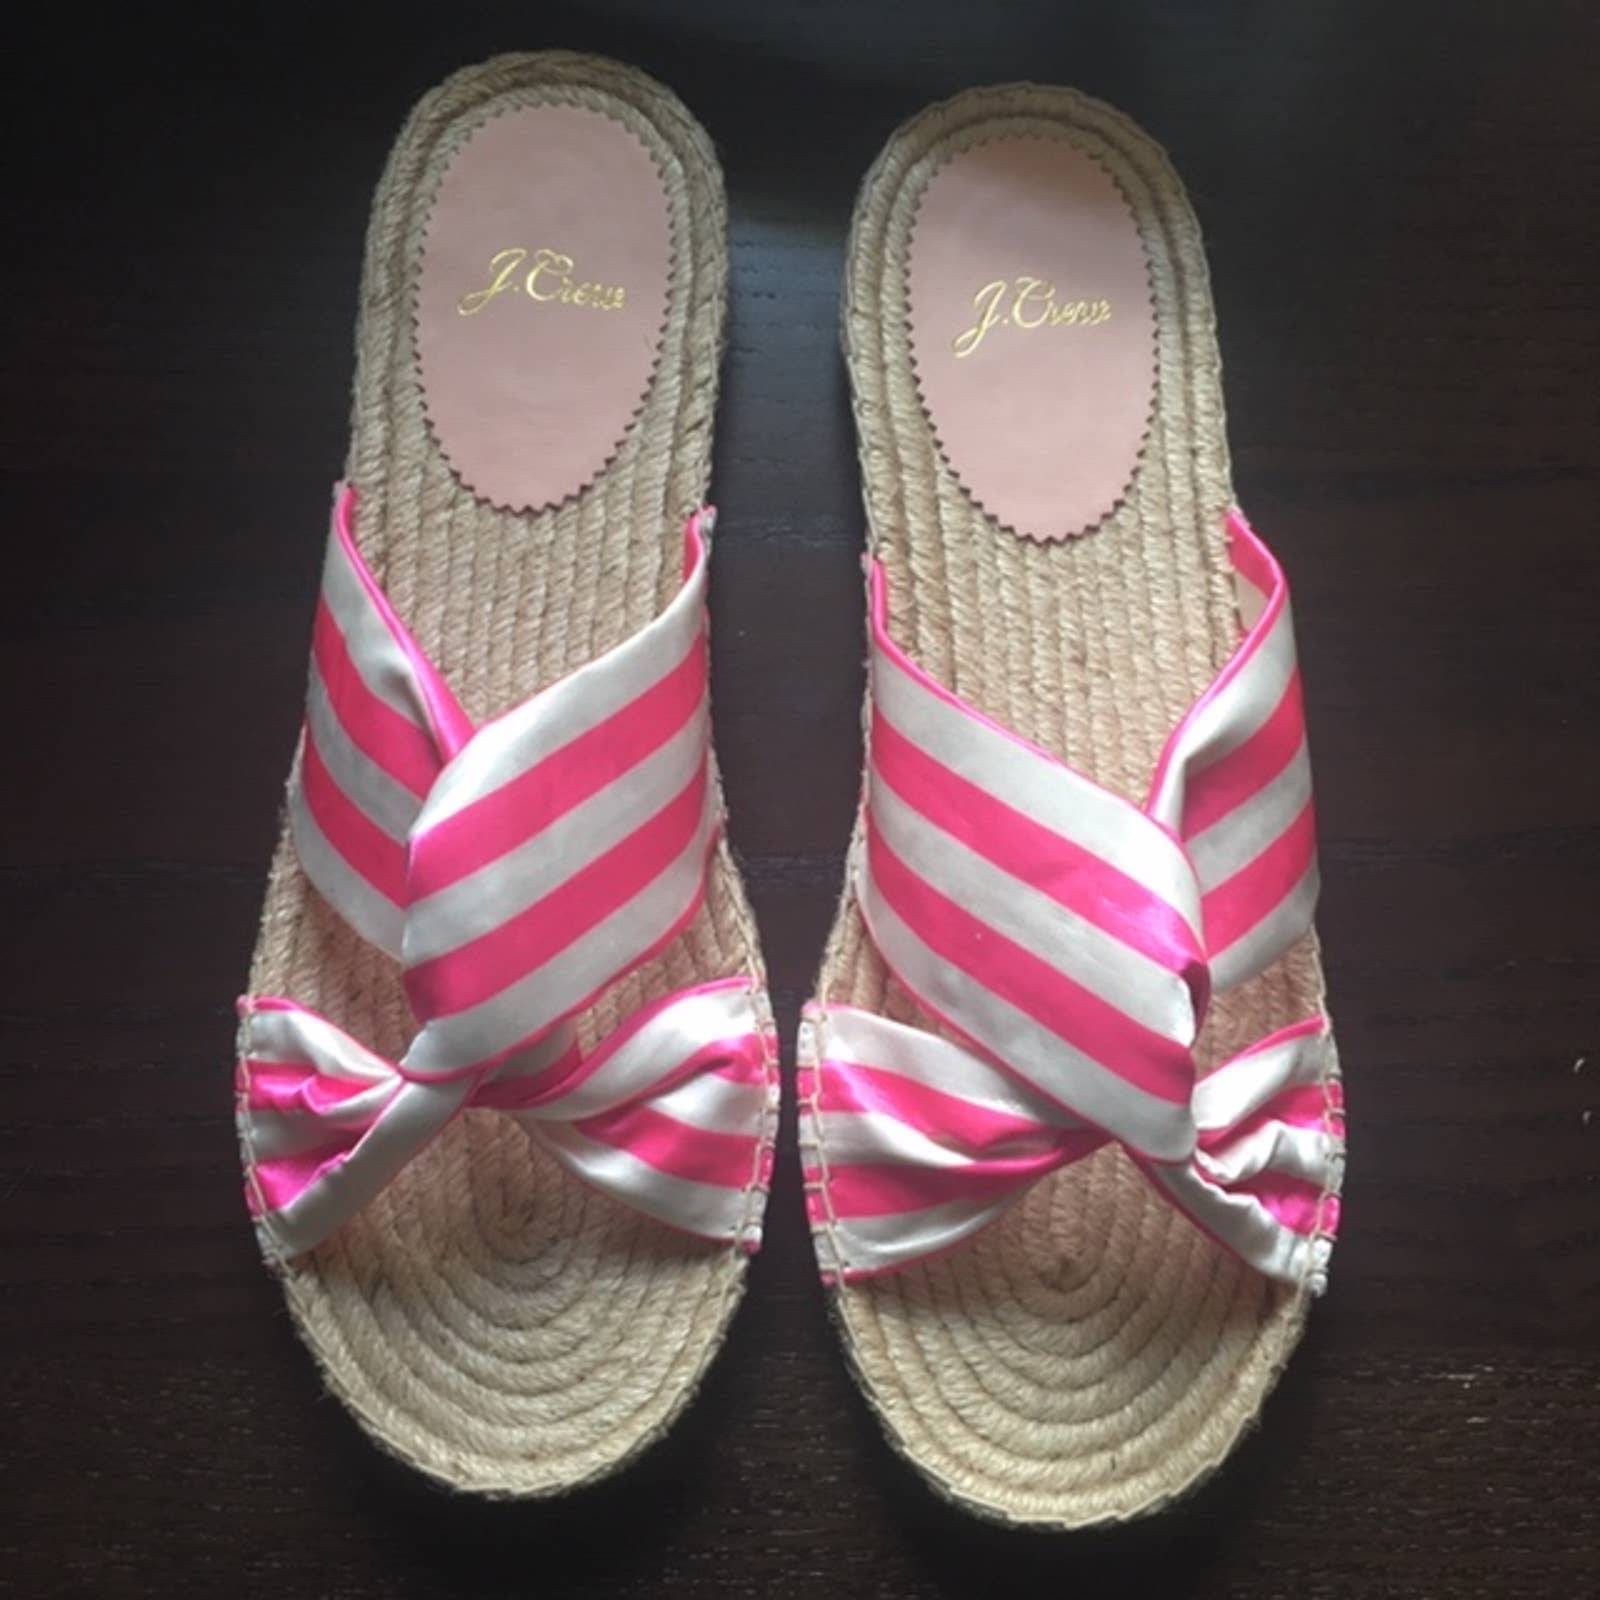 J.Crew Twisted knot espadrille sandals